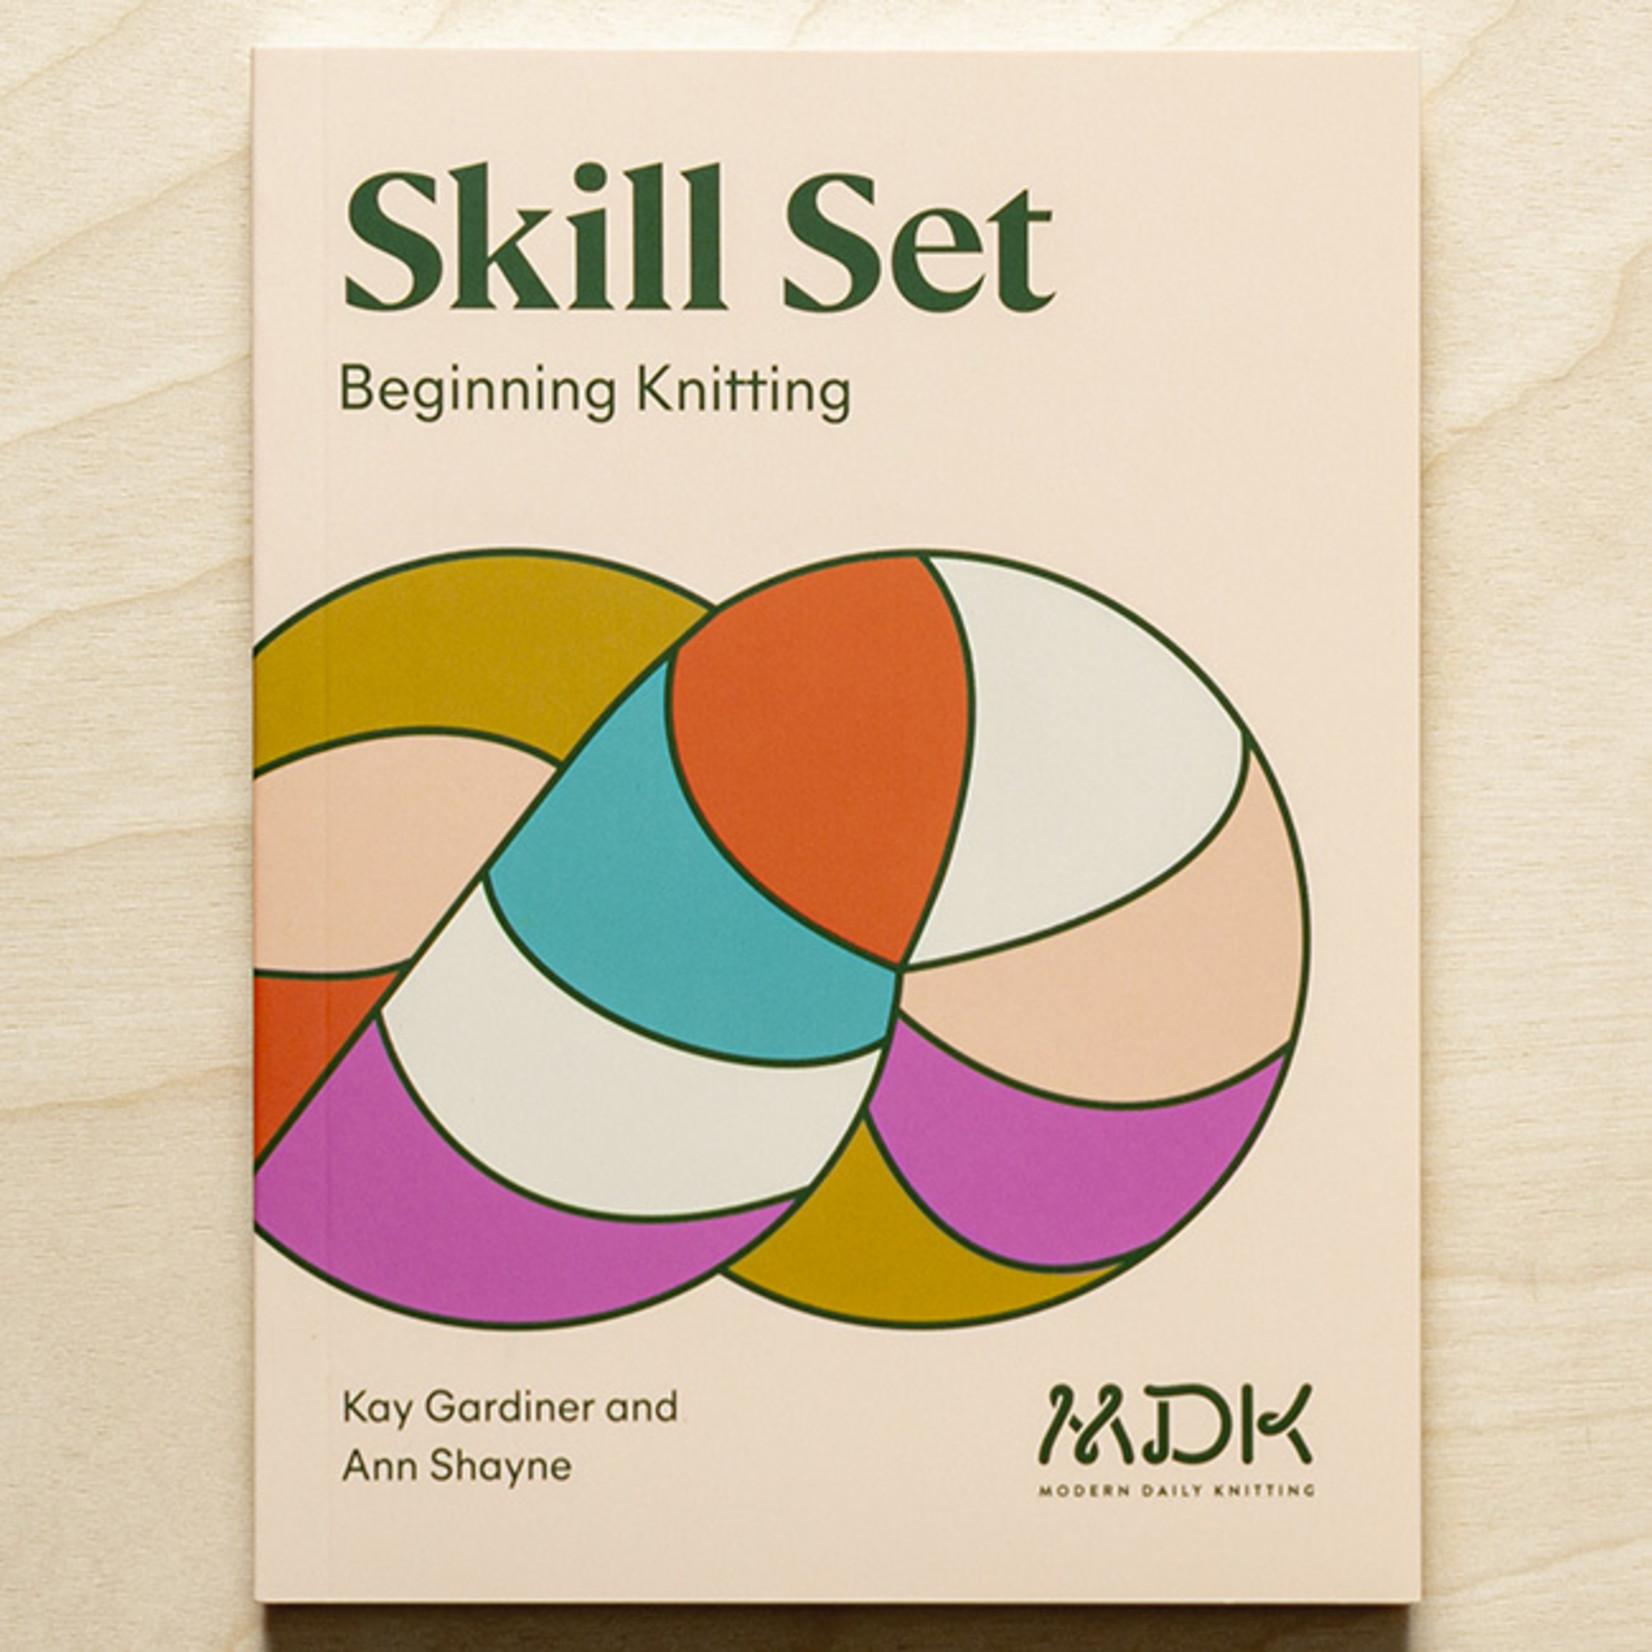 Modern Daily Knitting Skill Set: Beginning Knitting